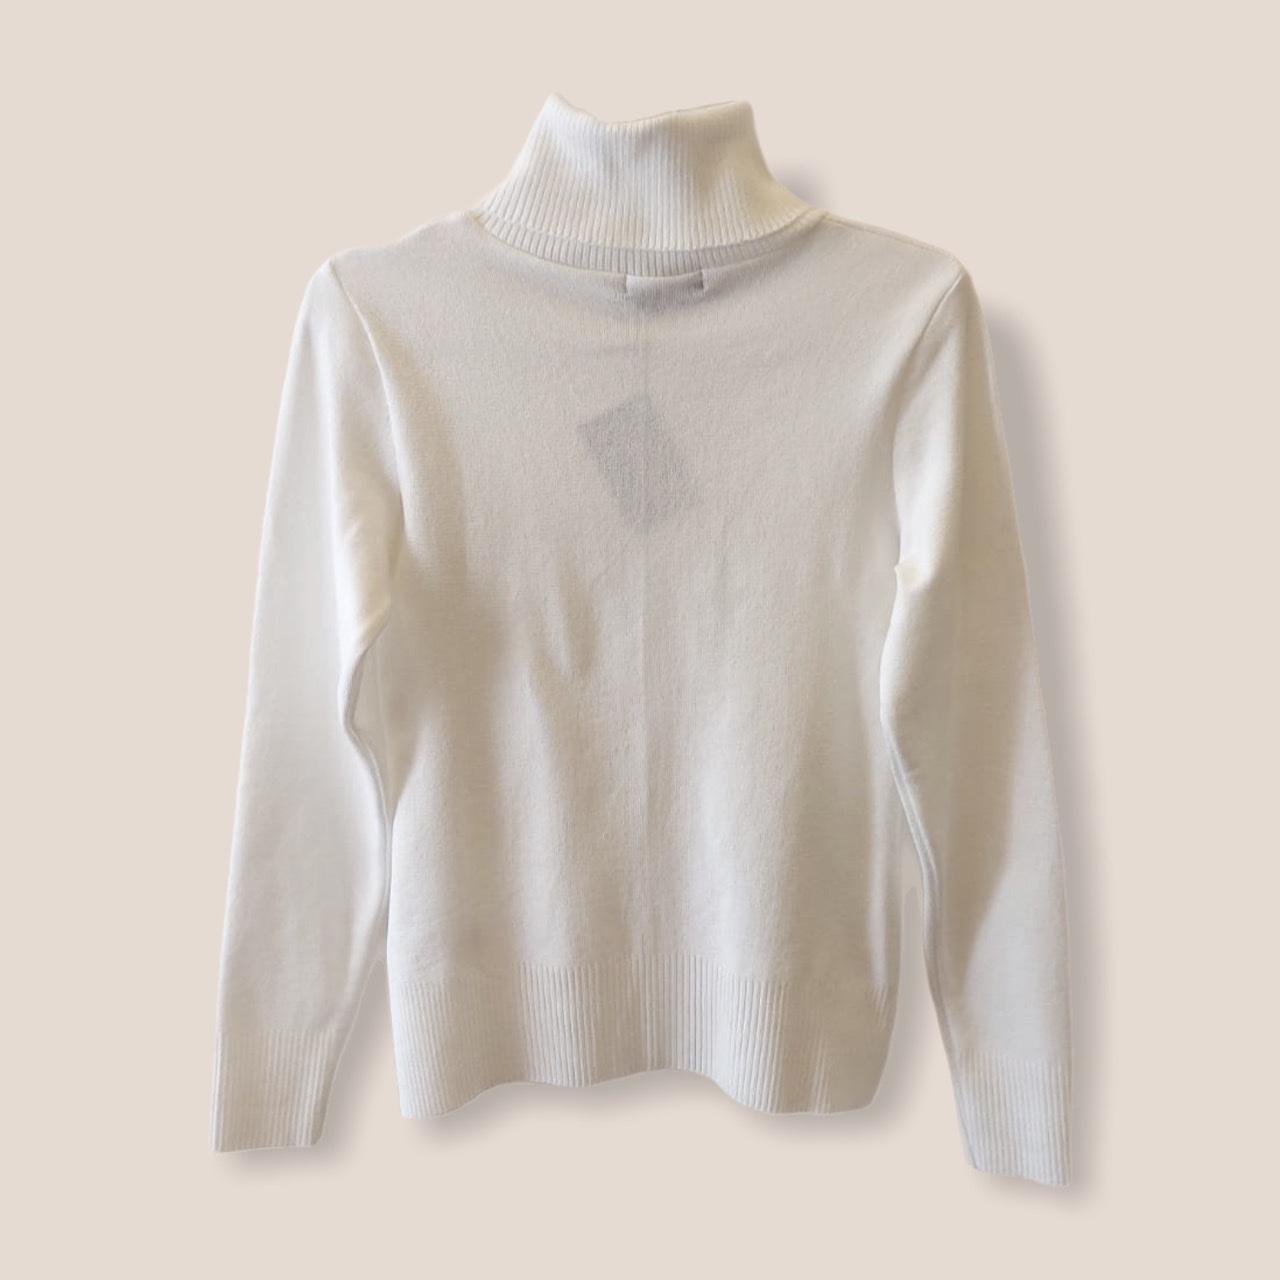 Blusa gola rolê branca tricot  - Vivian Bógus